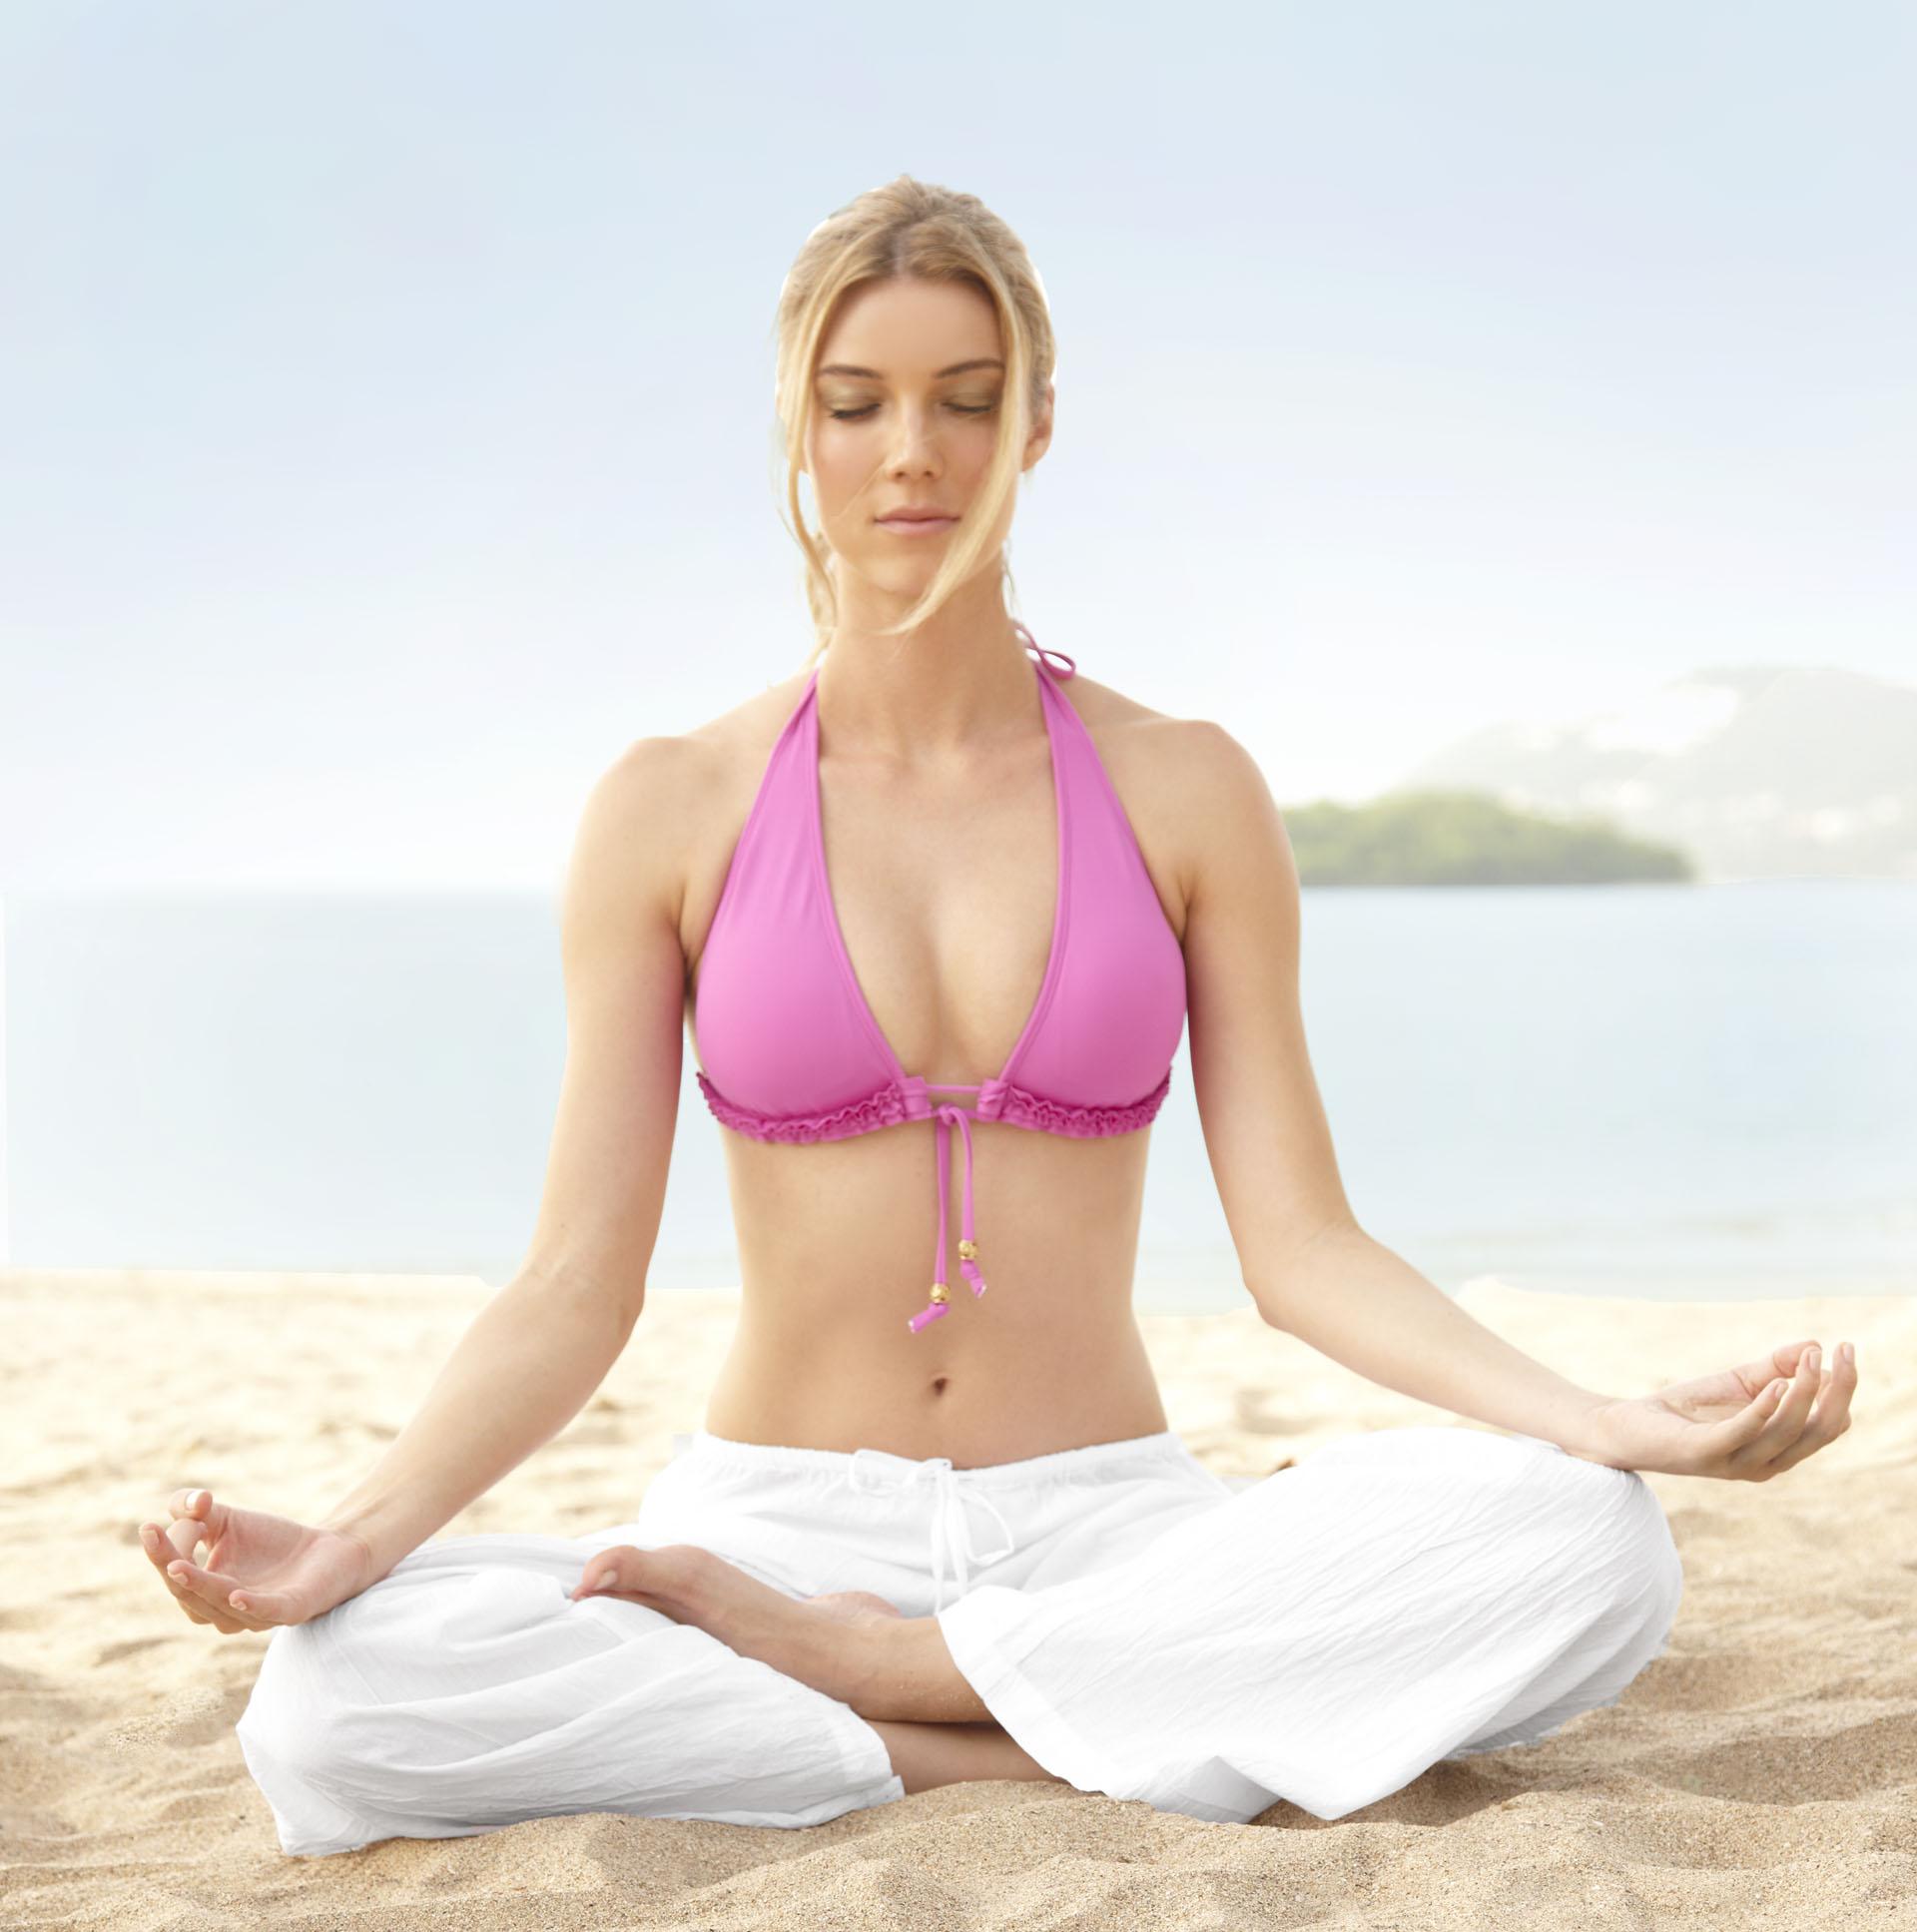 yoga-image-1-3649